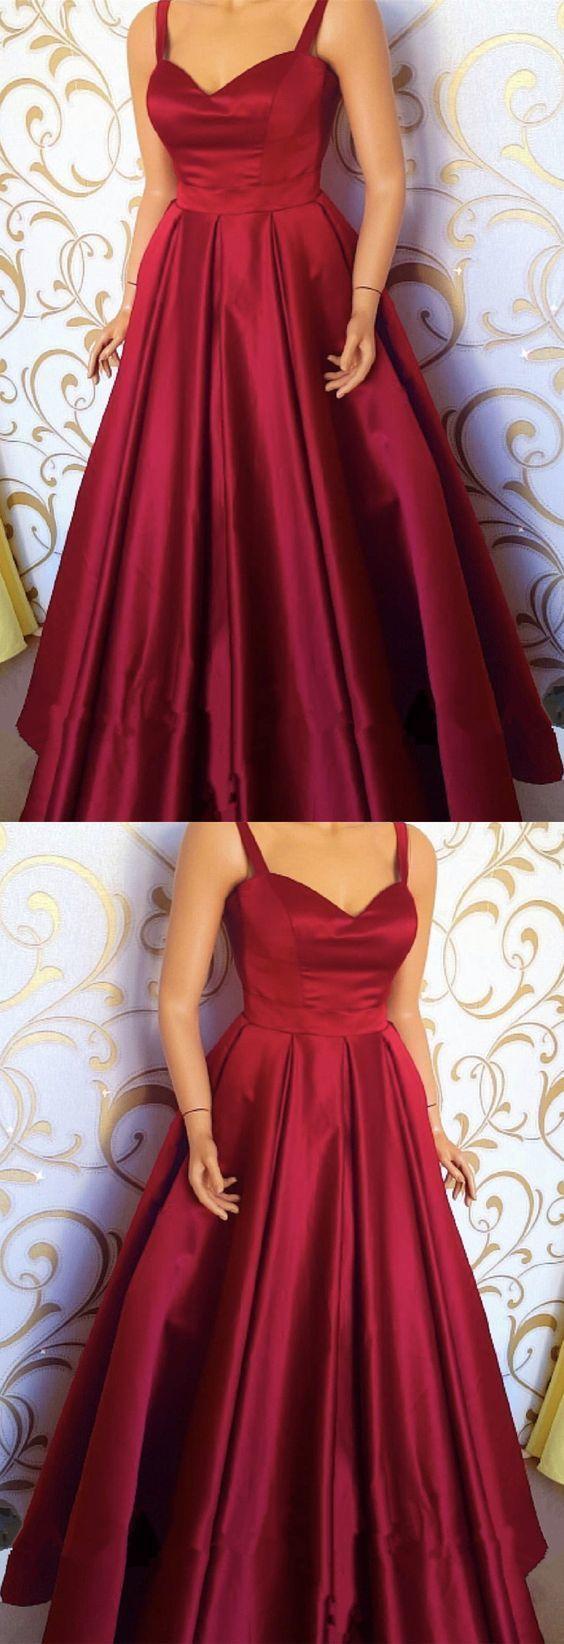 Burgundy Satin Sweetheart Floor Length Prom Dresses With Straps